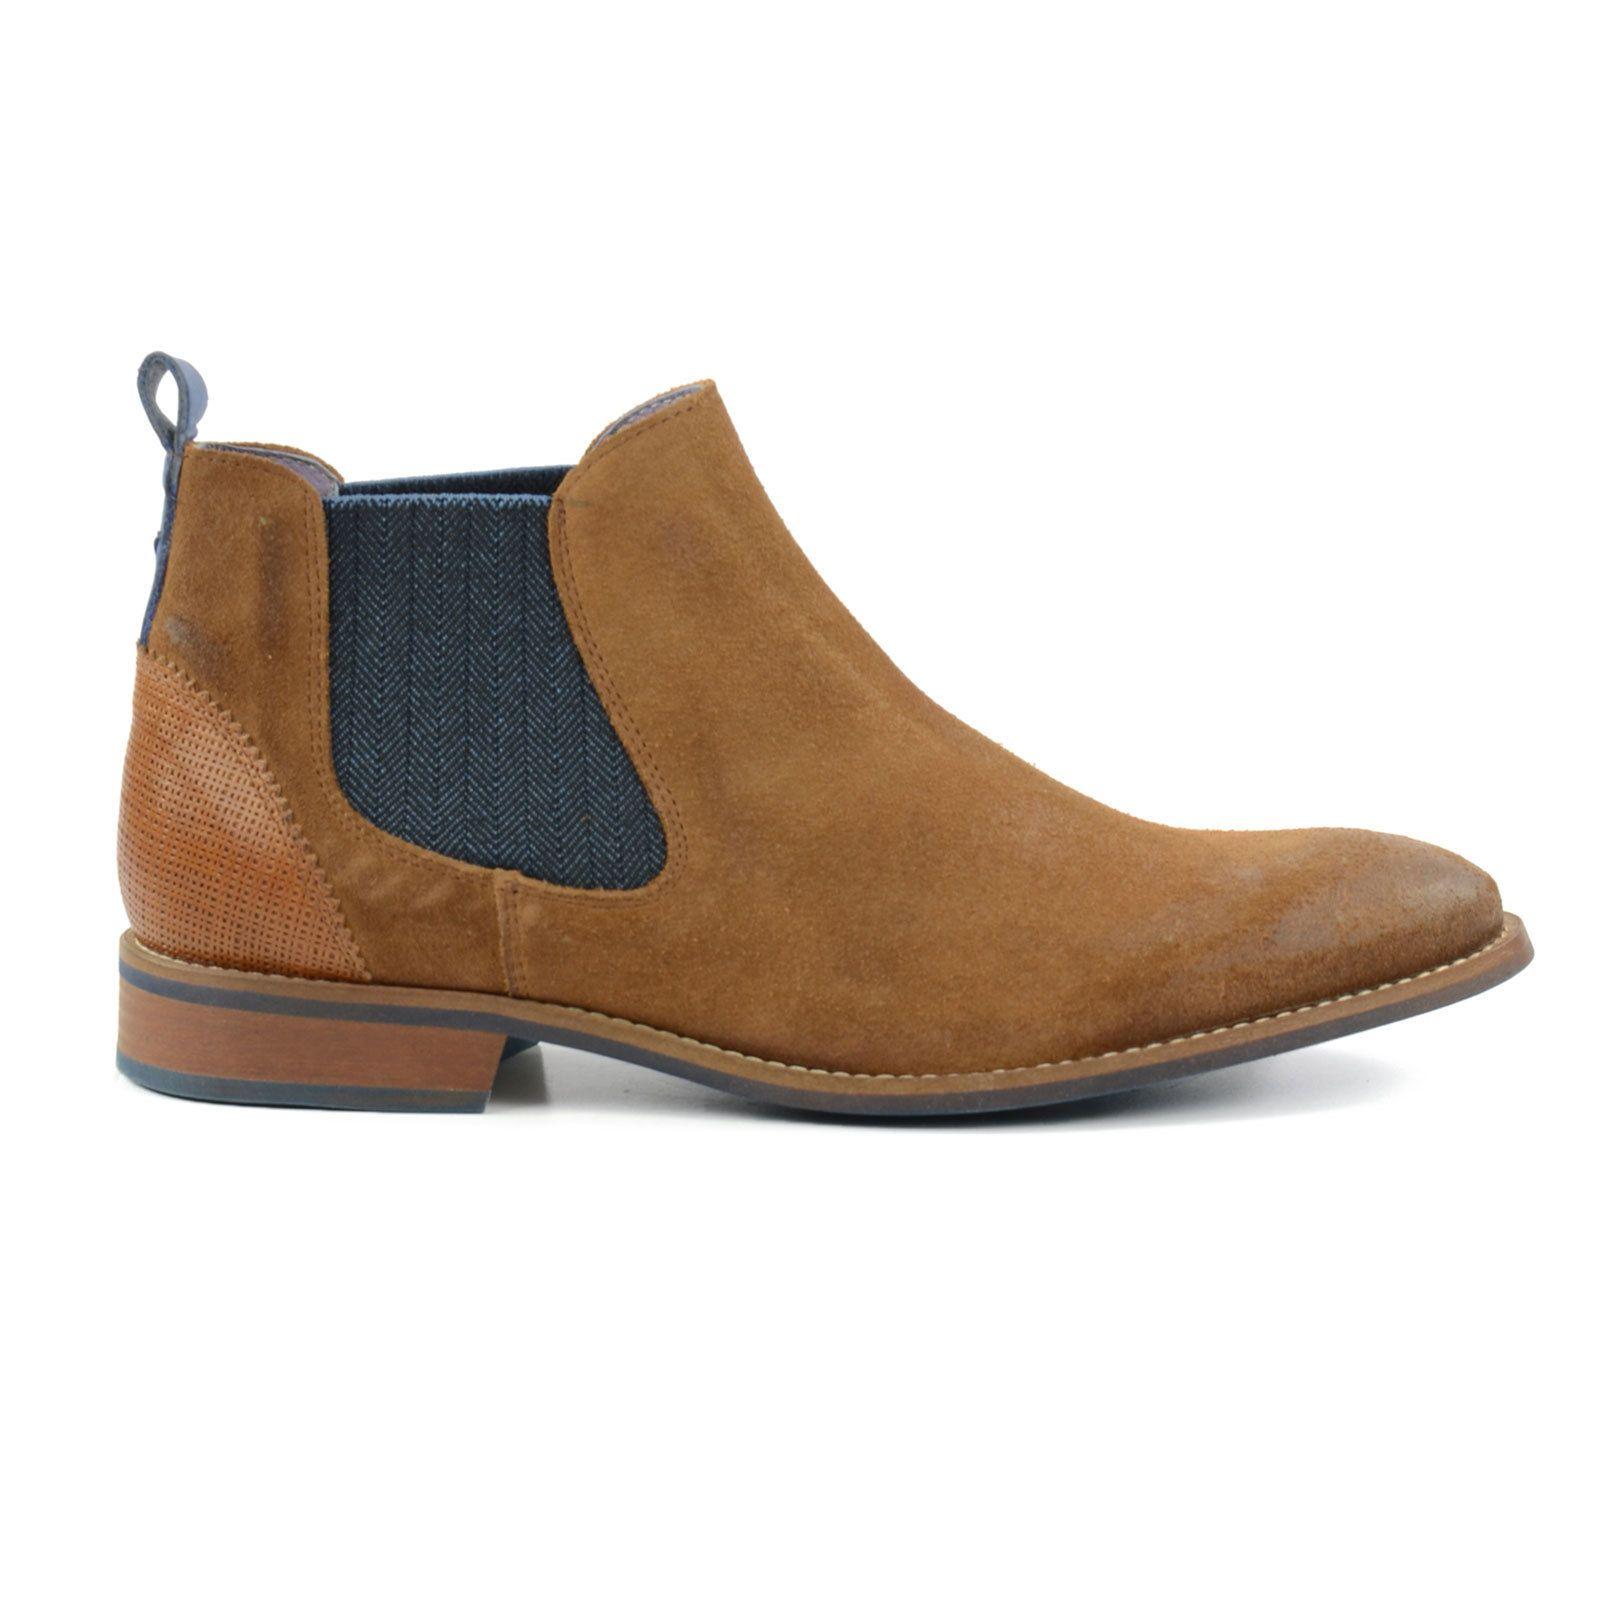 Bottines Chelsea en daim - Marron - MarronZign Shoes ejAAye